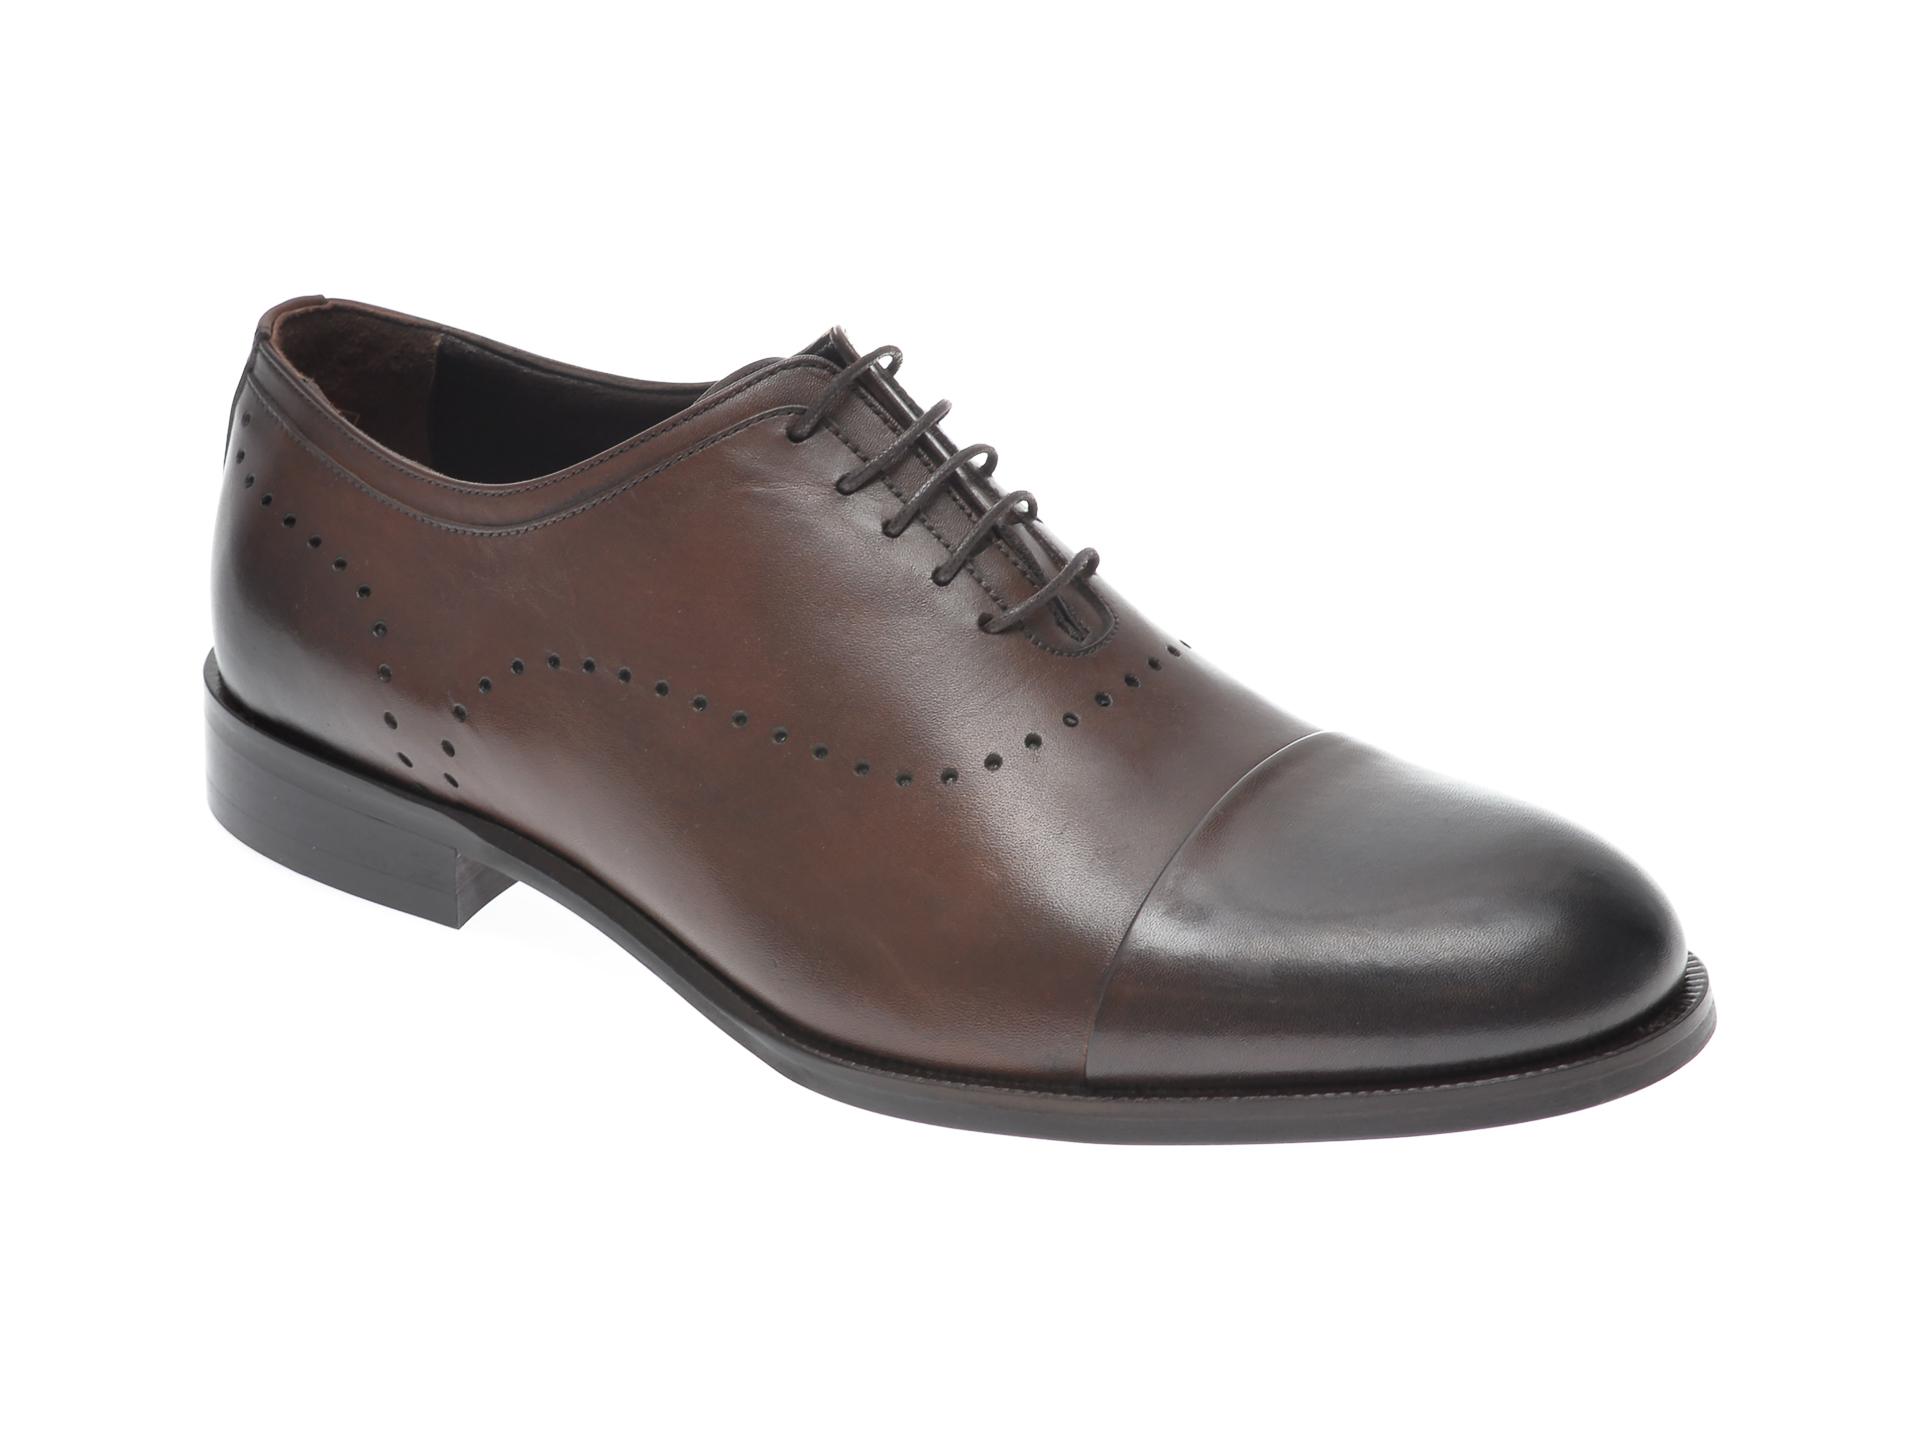 Pantofi OTTER maro, 7844, din piele naturala imagine